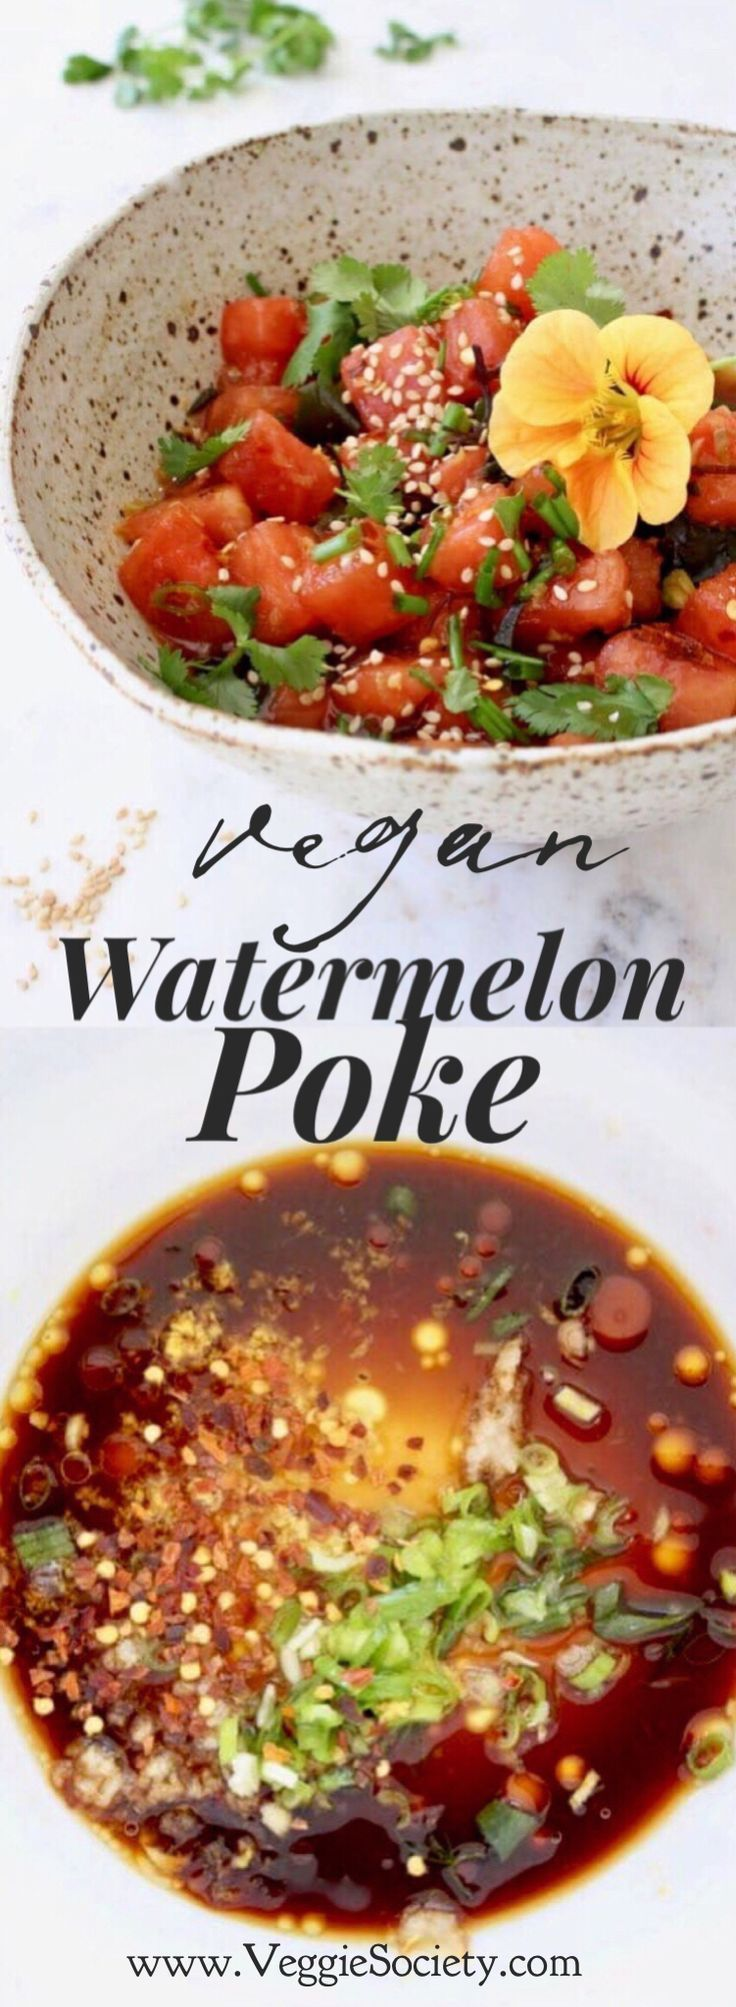 Watermelon Vegan Poke Bowl Recipe with Sea Vegetables, Garlic and Ginger |